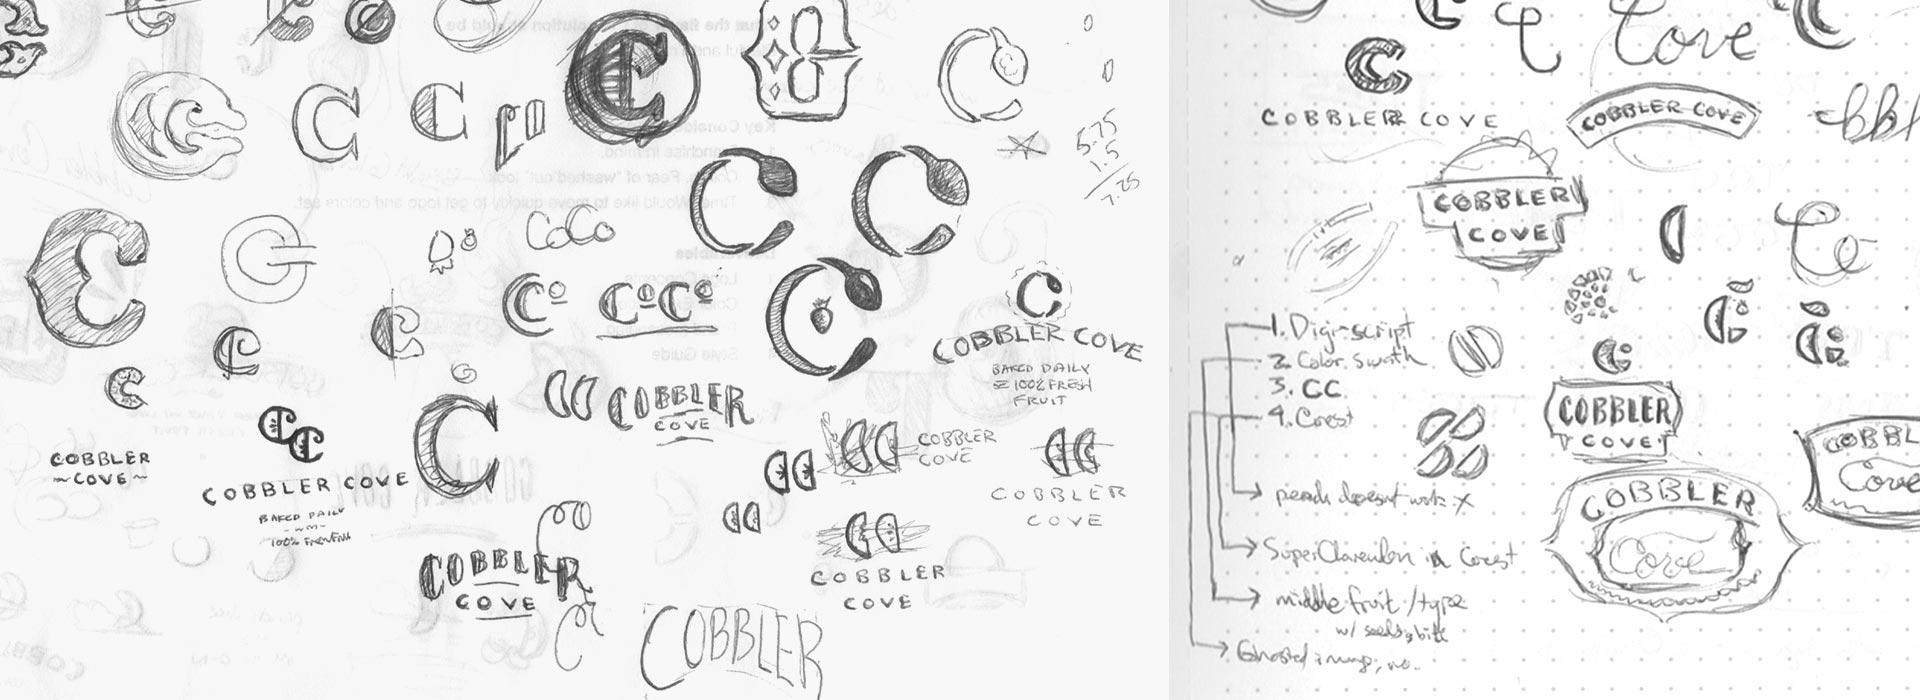 Cobbler-sketches.jpg